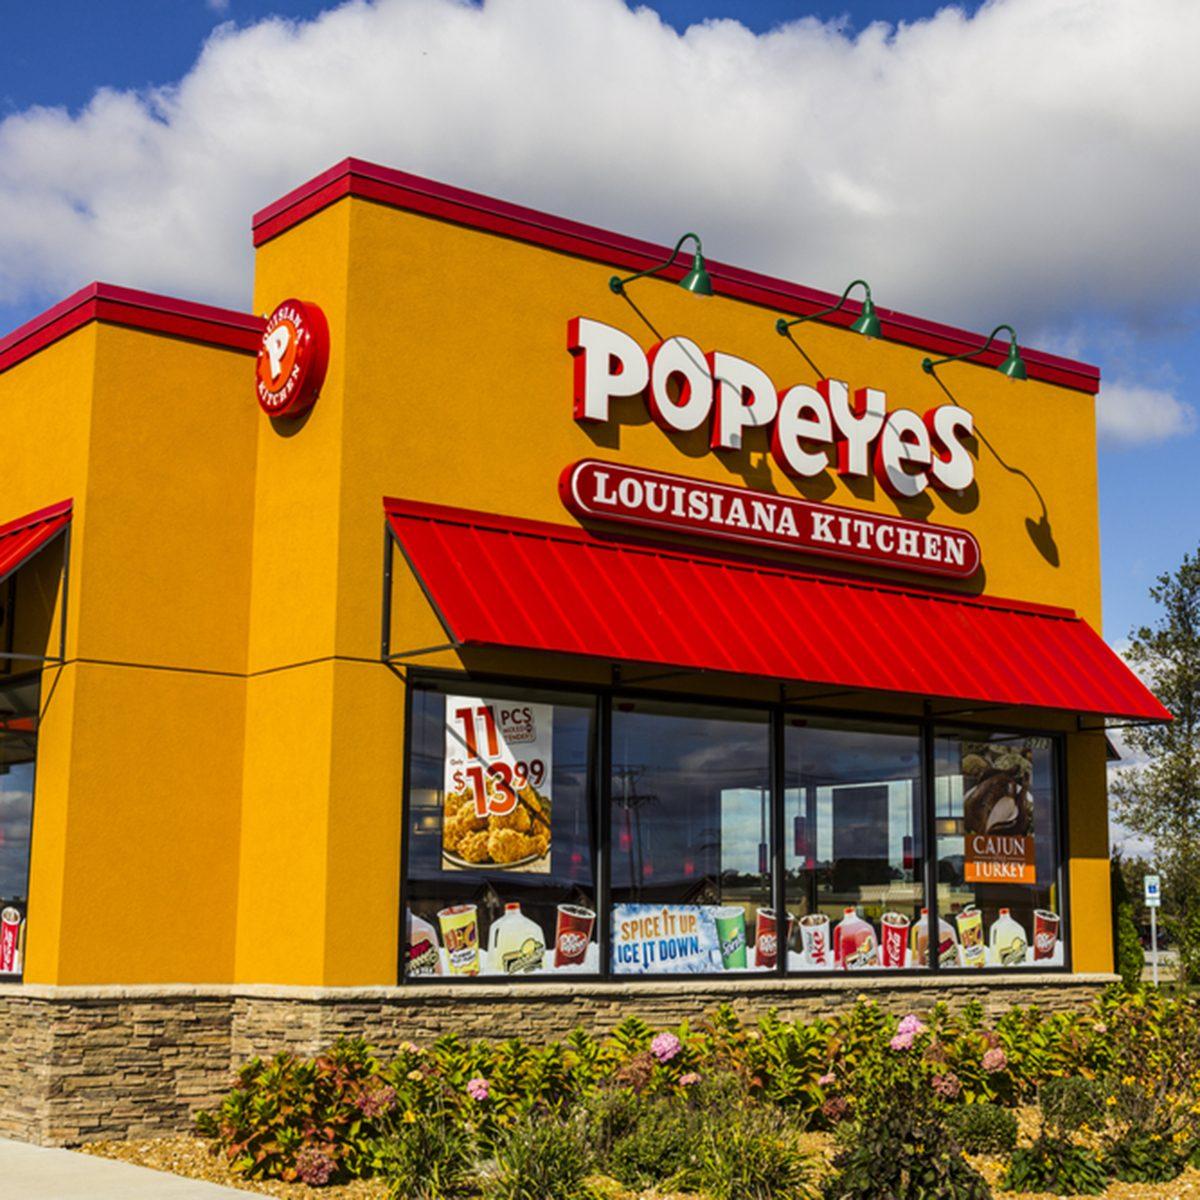 Popeyes Louisiana Kitchen Fast Food Restaurant.